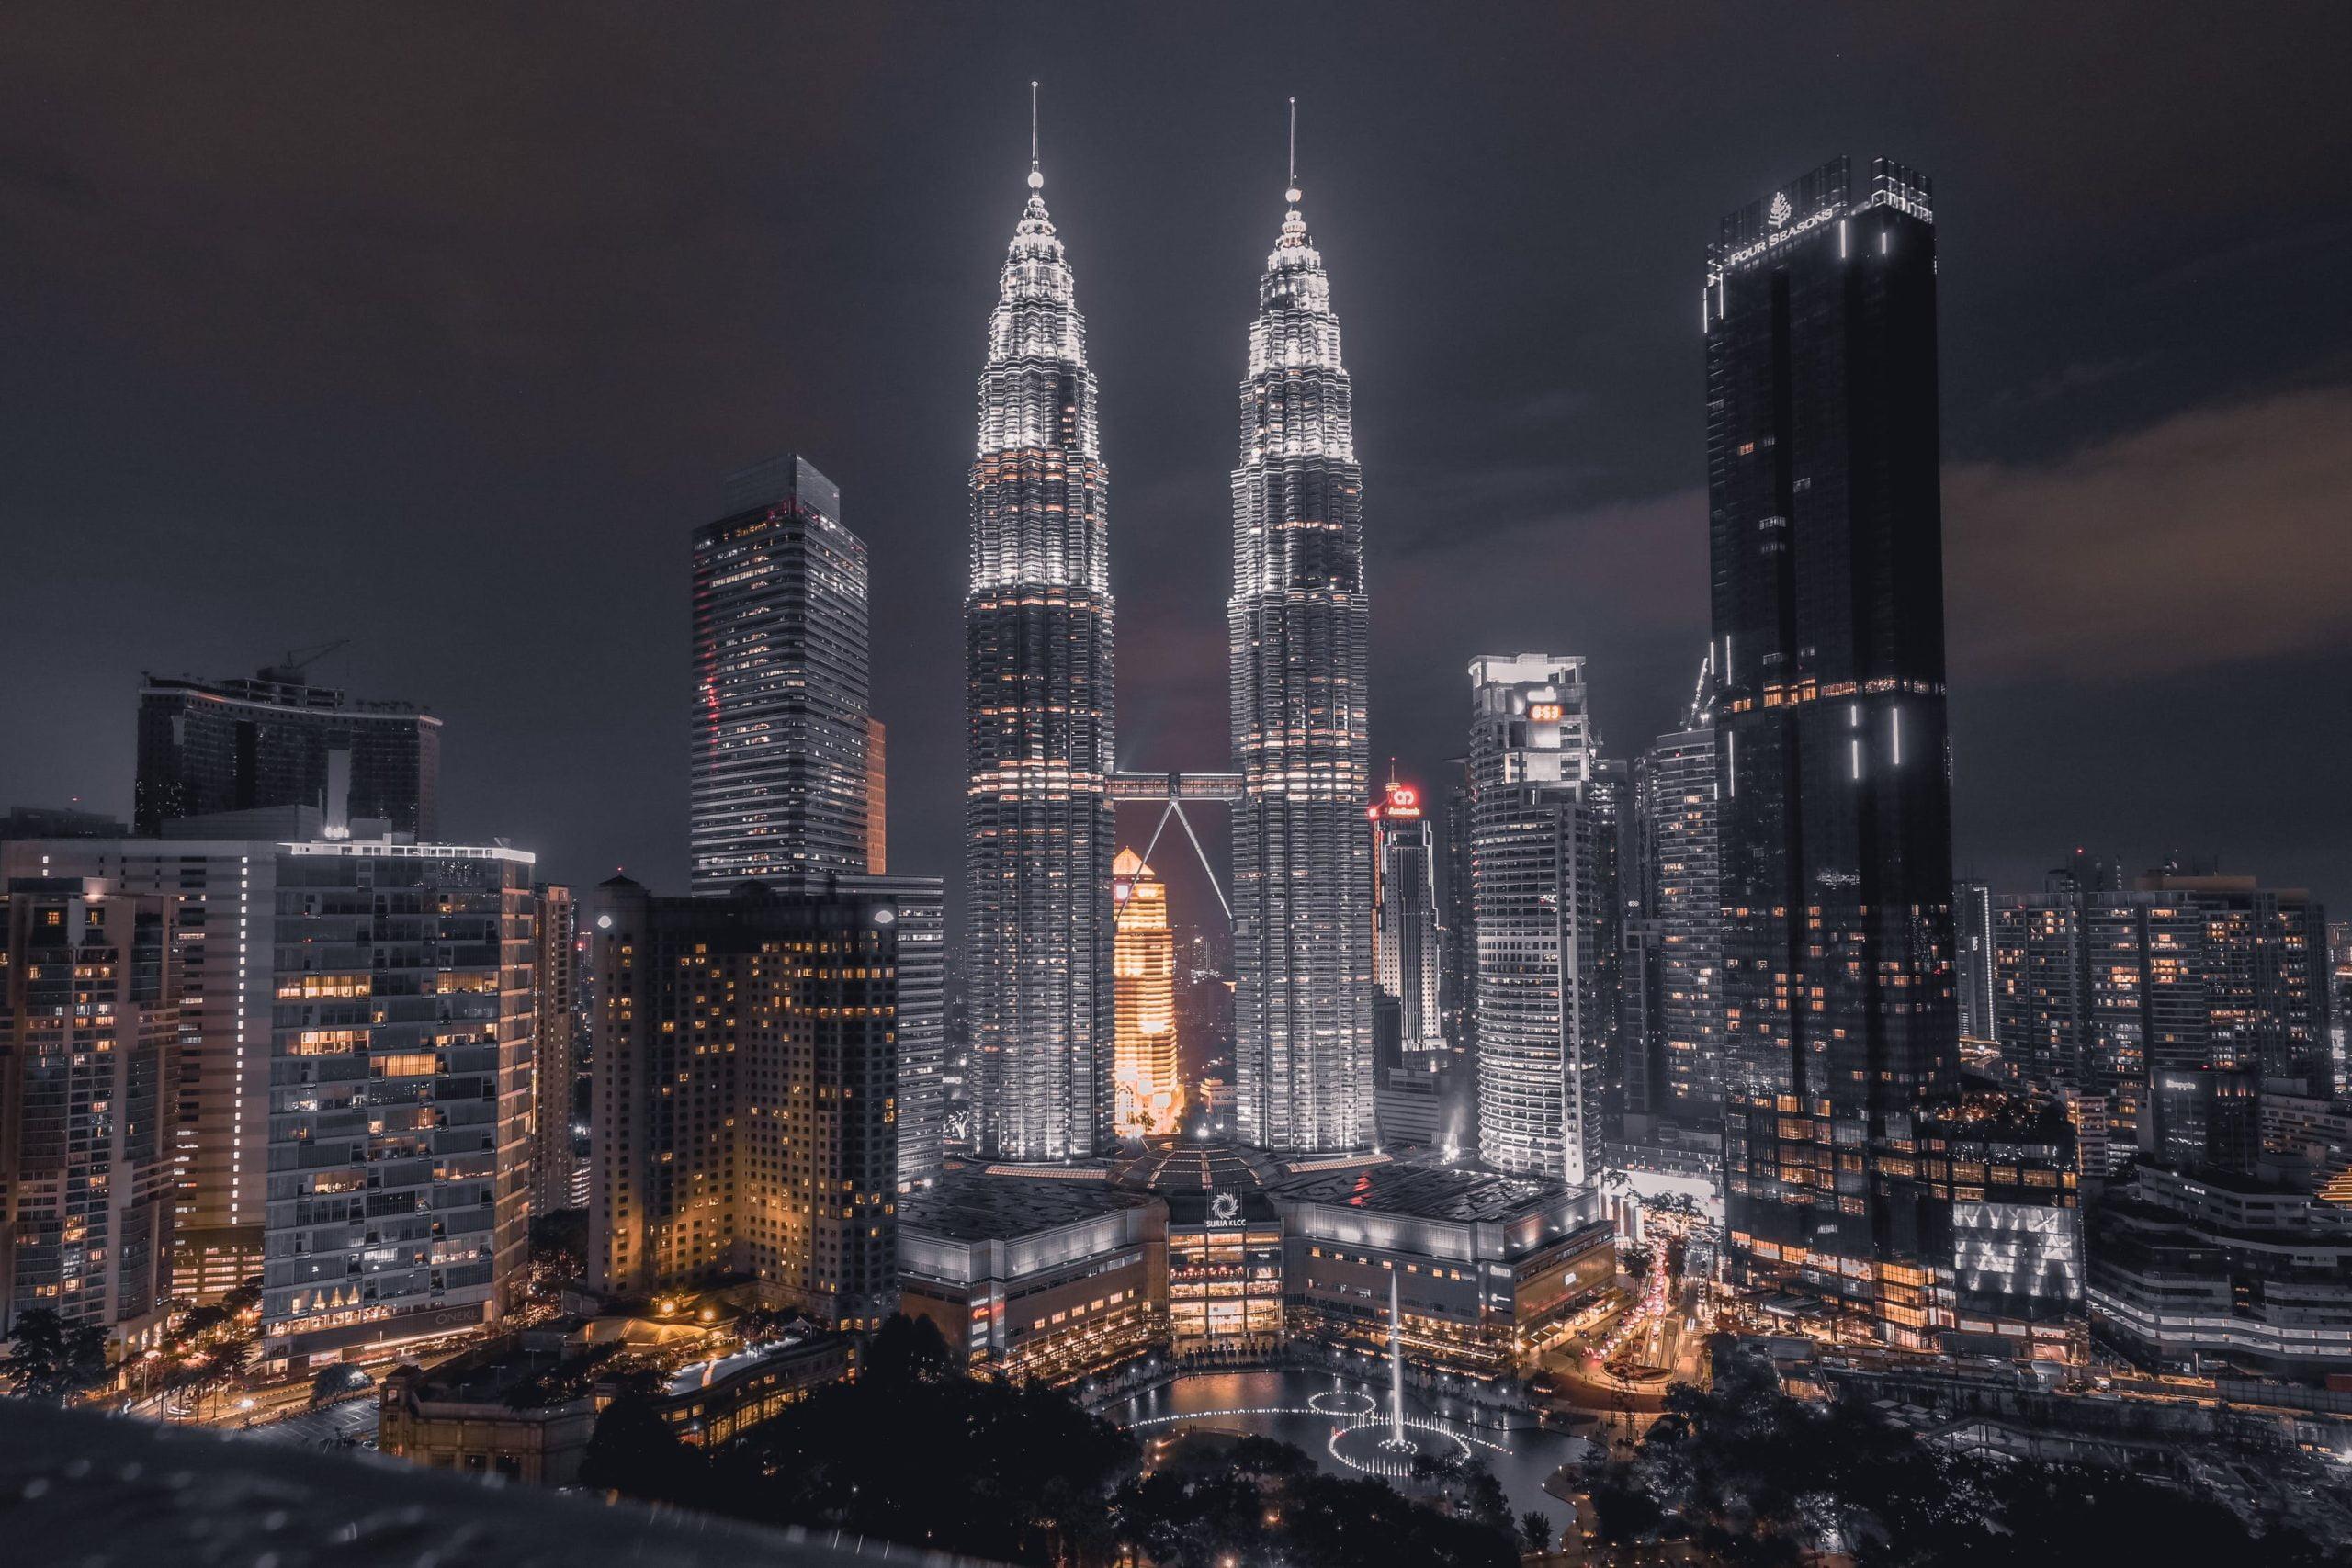 Cuci Mata Jom! Singgah Kejap Kat 7 Mall Terbaik di Malaysia